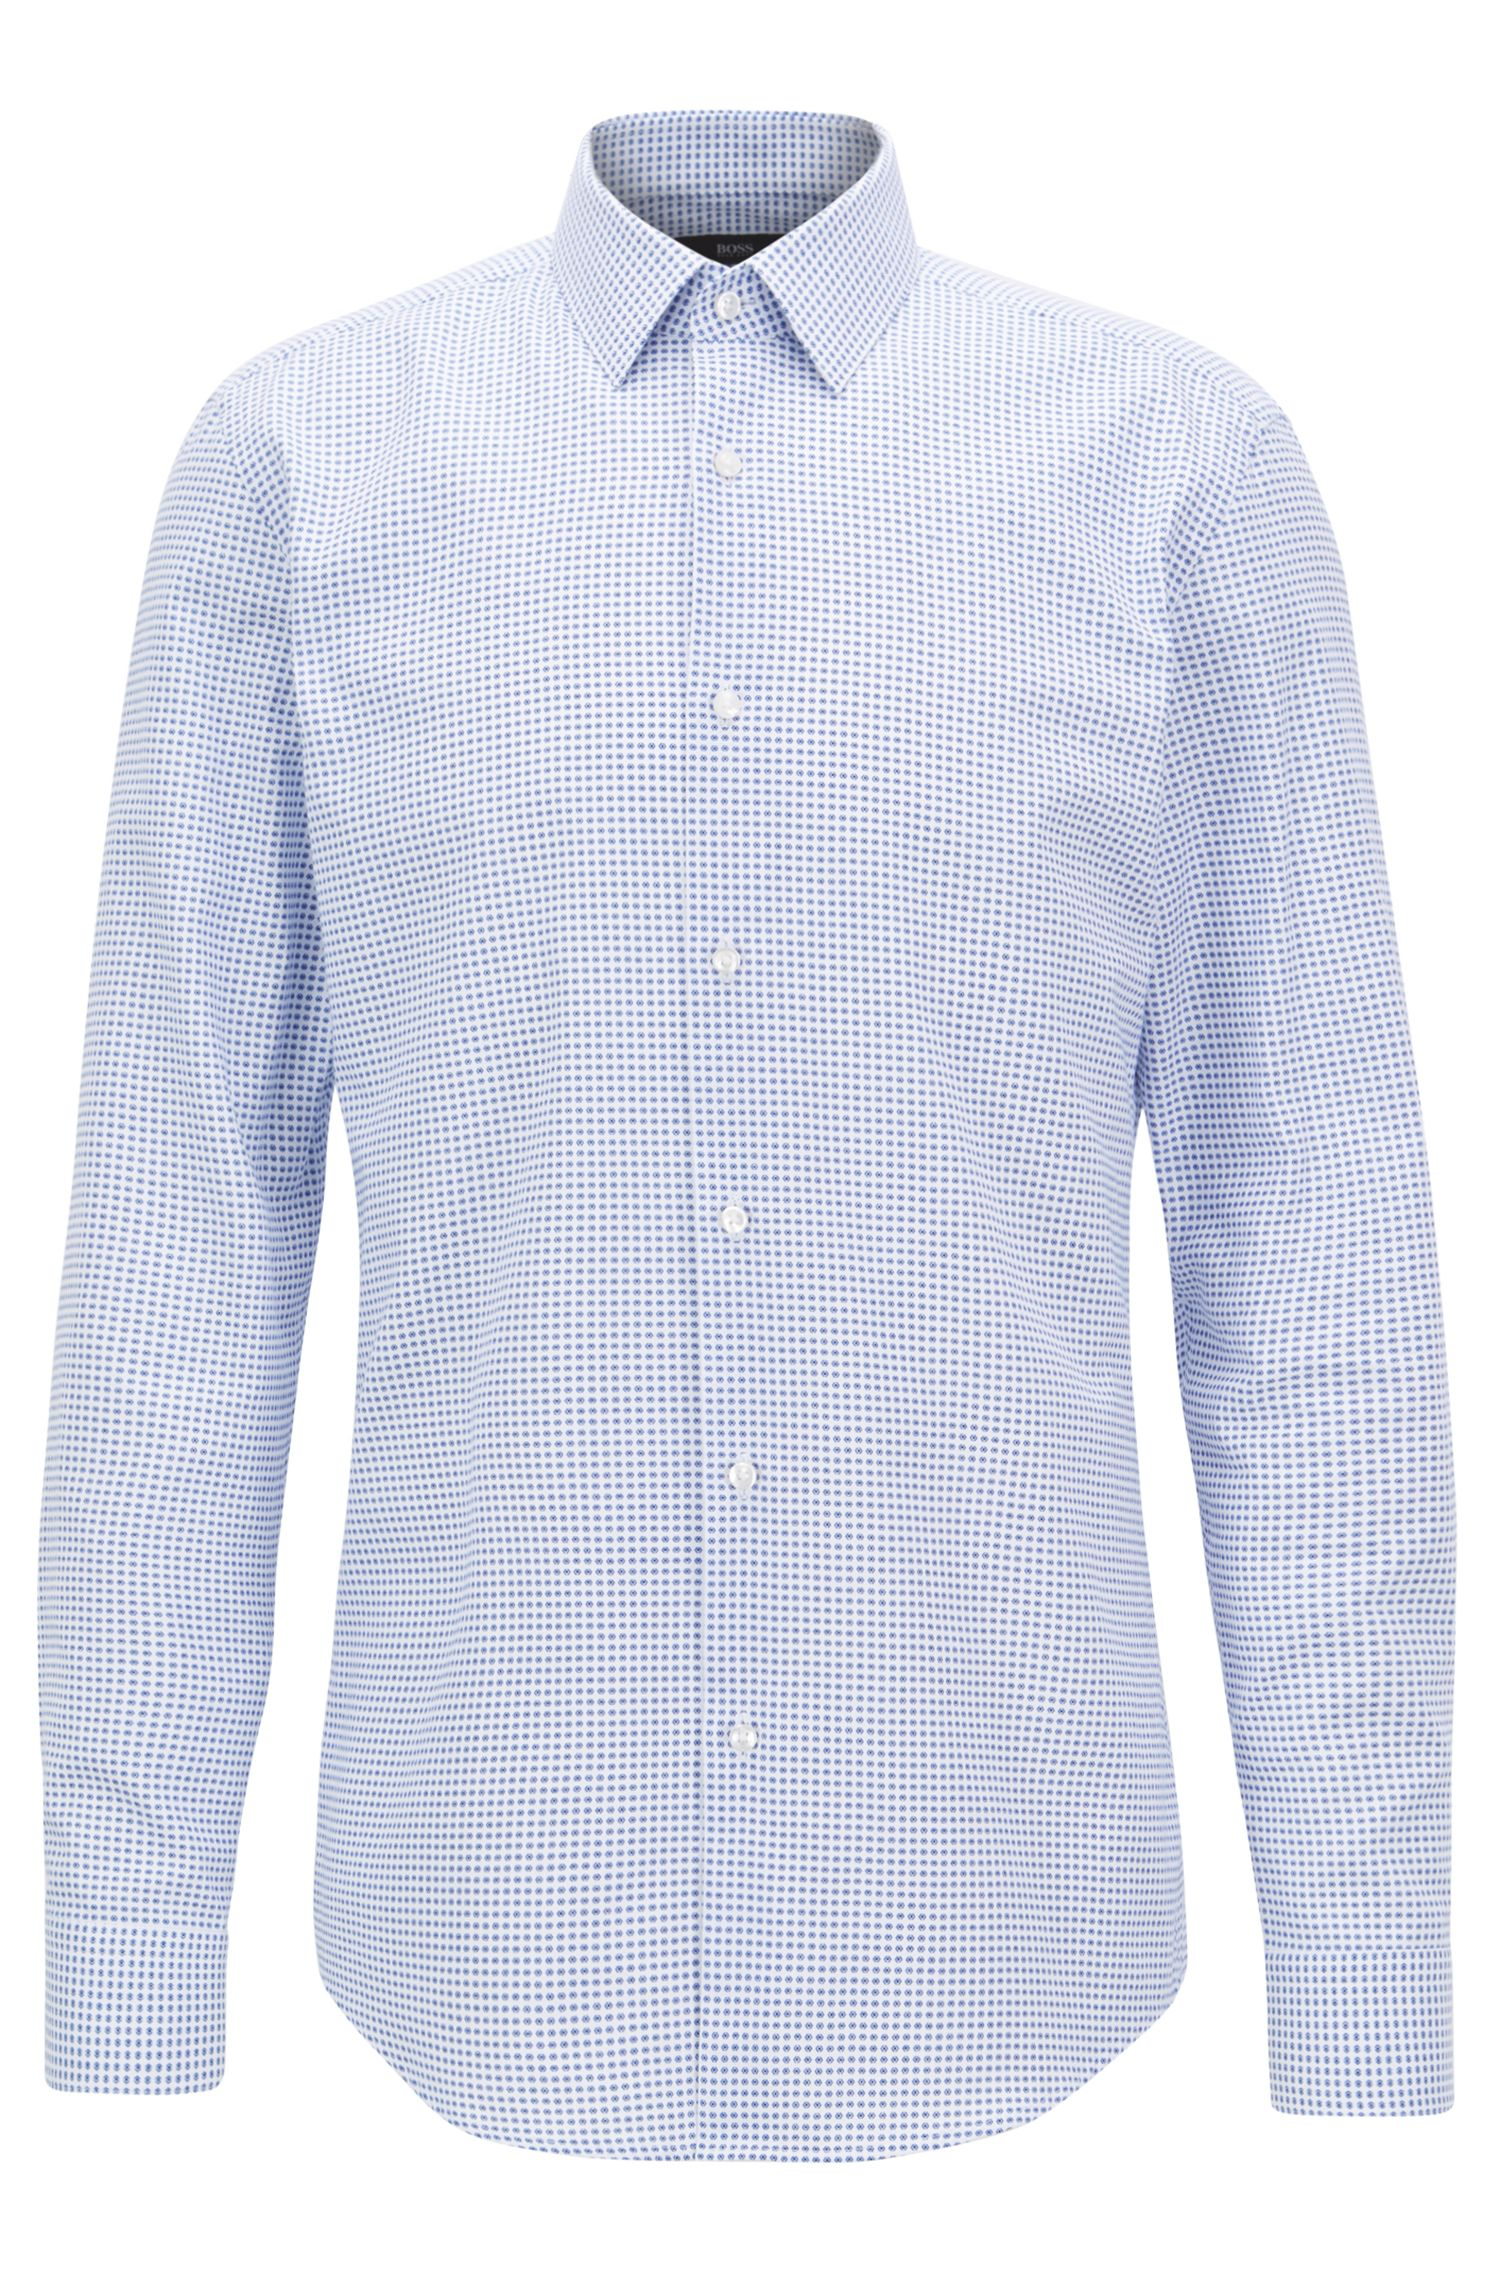 Slim-fit shirt in geometric-print Italian-made cotton